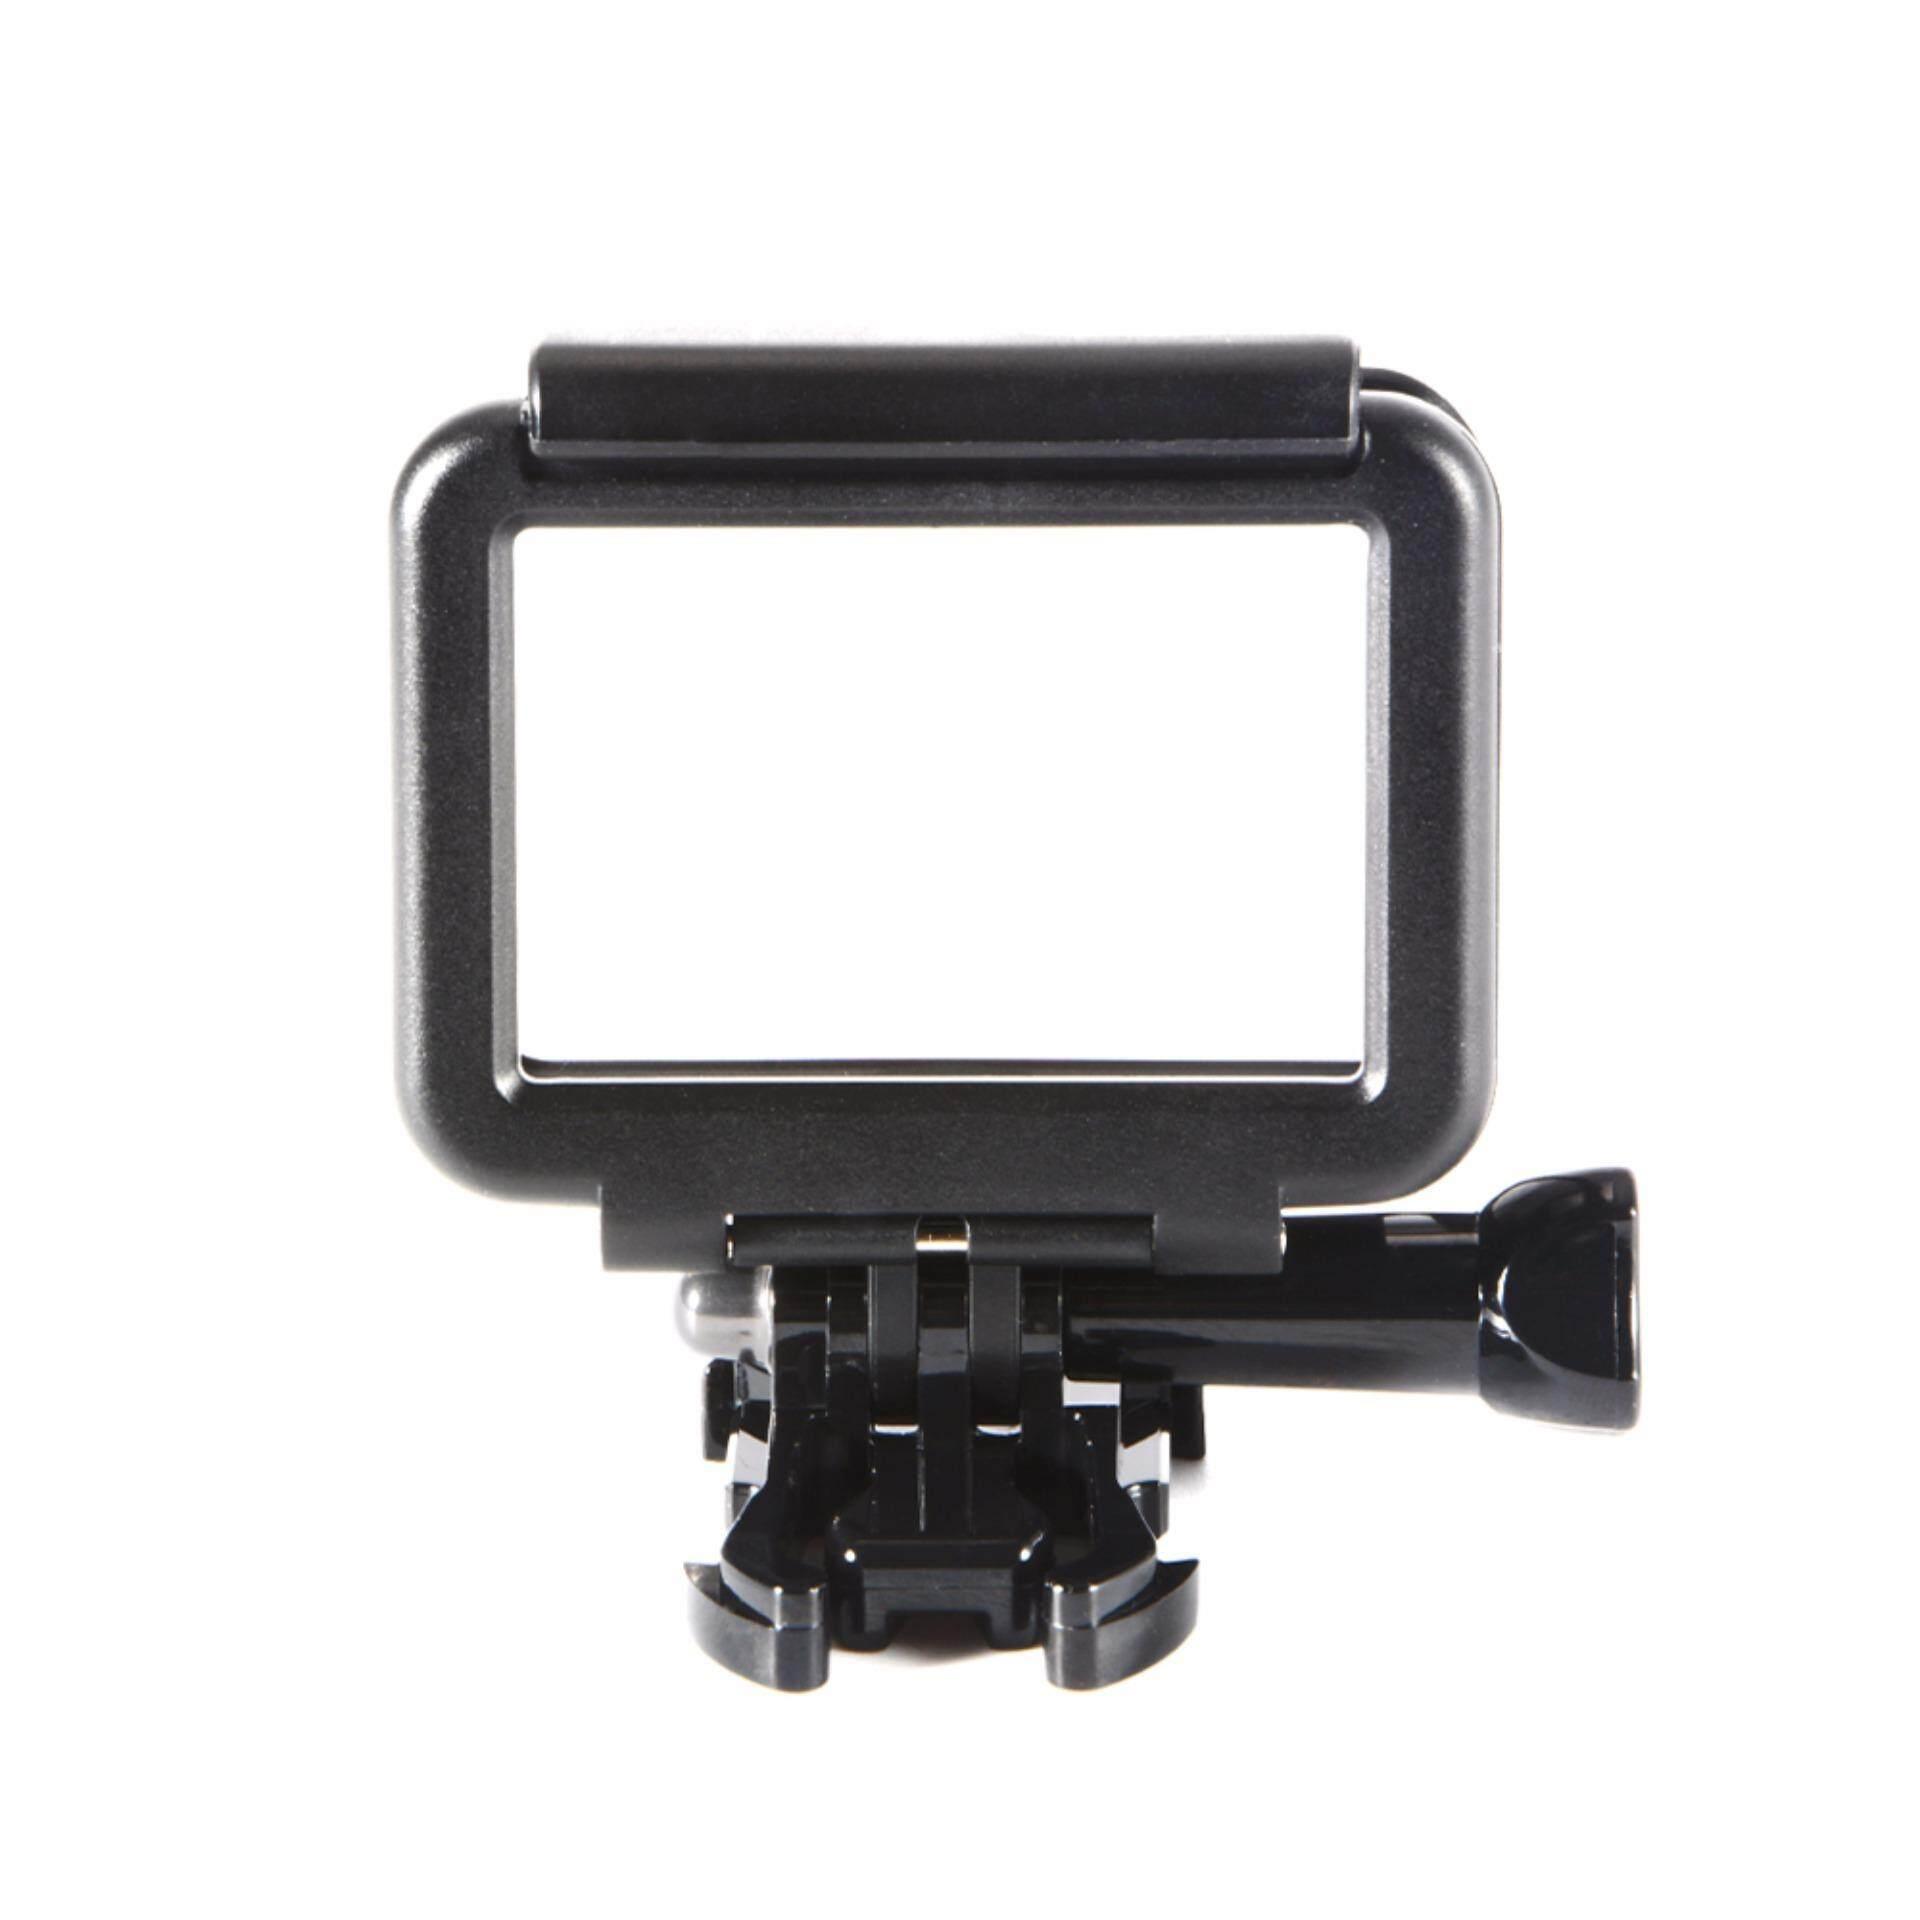 Detail Gambar Protective Frame Mount Protector Shell Case for Gopro Hero 5 Action Camera Terbaru